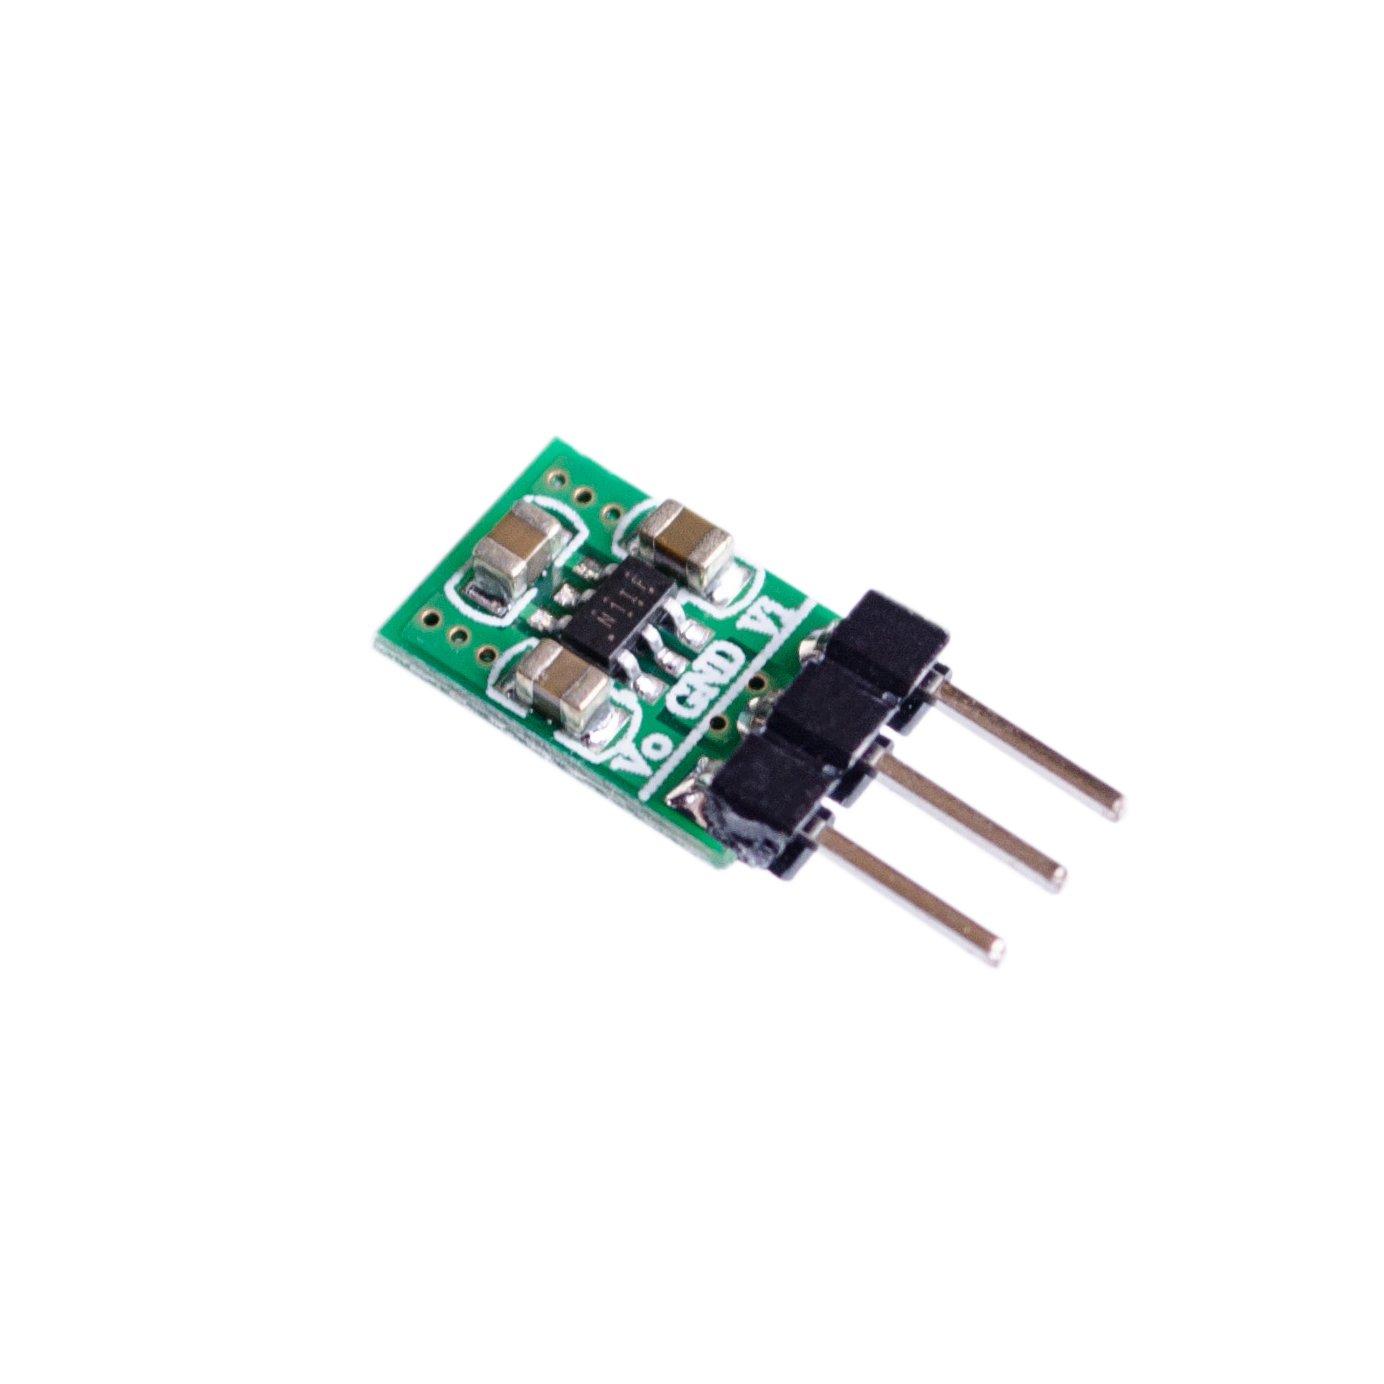 10PCS/LOT Mini 2 in 1 DC DC Step-Down & Step-Up Converter 1.8V-5V to 3.3V Power WiFi Bluetooth ESP8266 HC-05 CE1101 LED Module